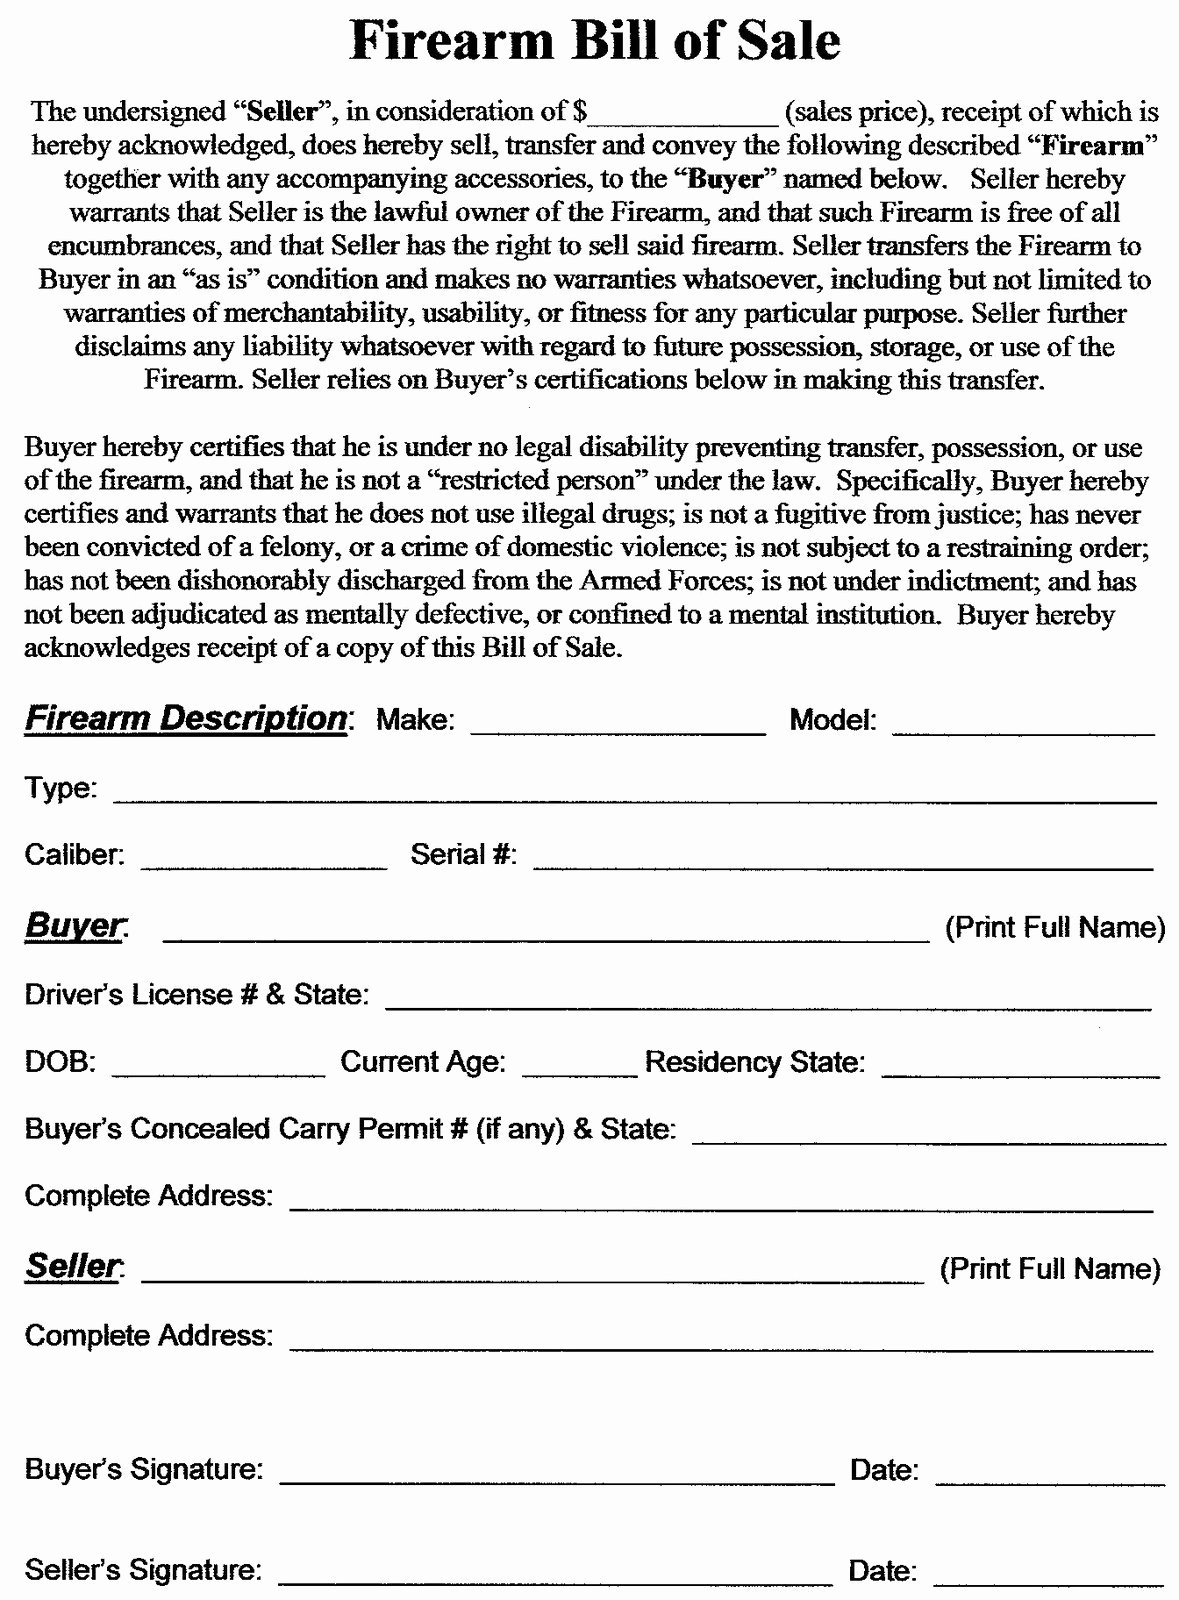 Gun Bill Of Sale Florida Fresh Firearm Bill Of Sale